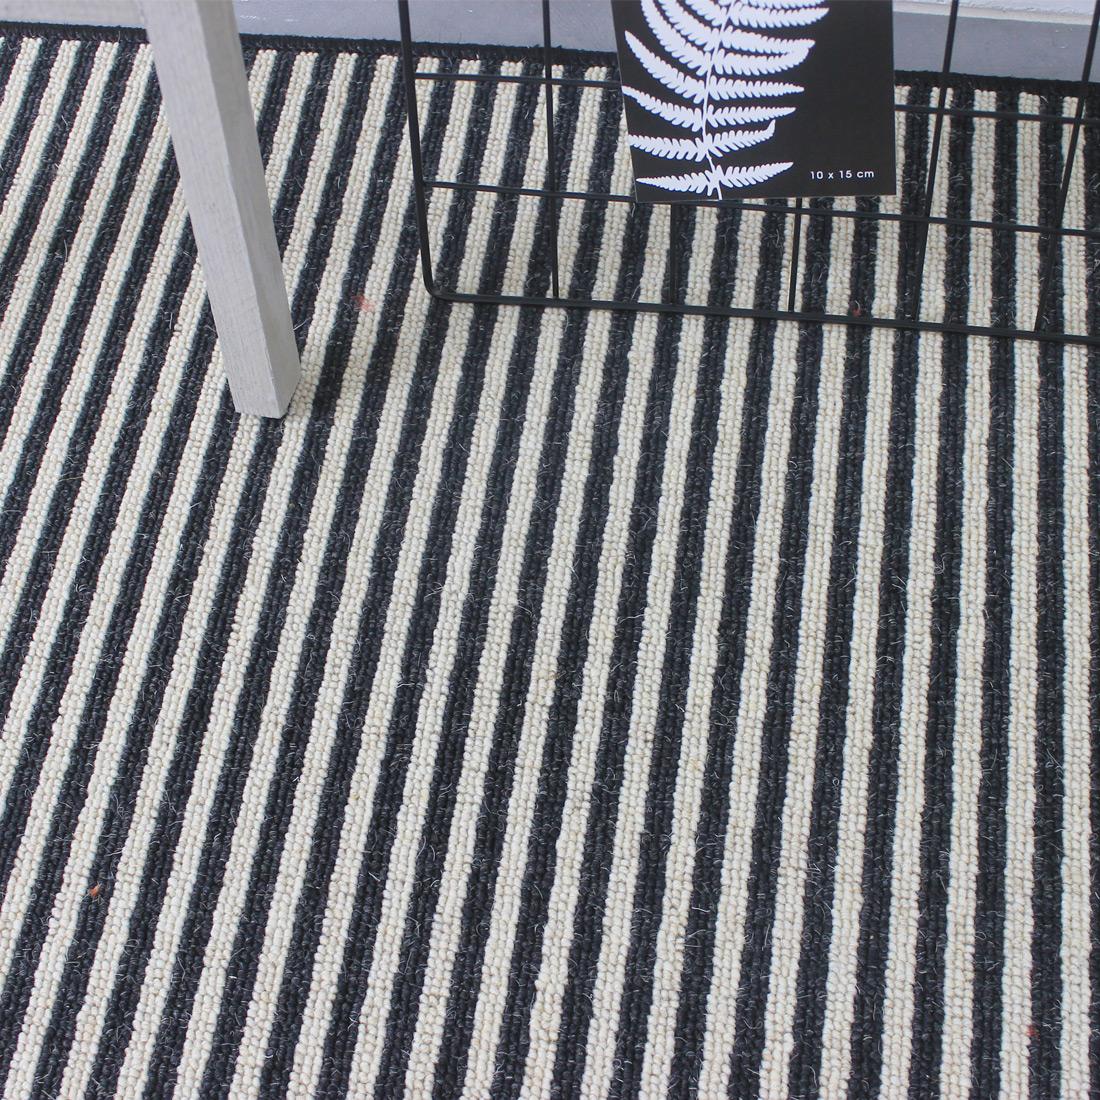 Rond Vloerkleed Boston (wol) Stripe Zebra